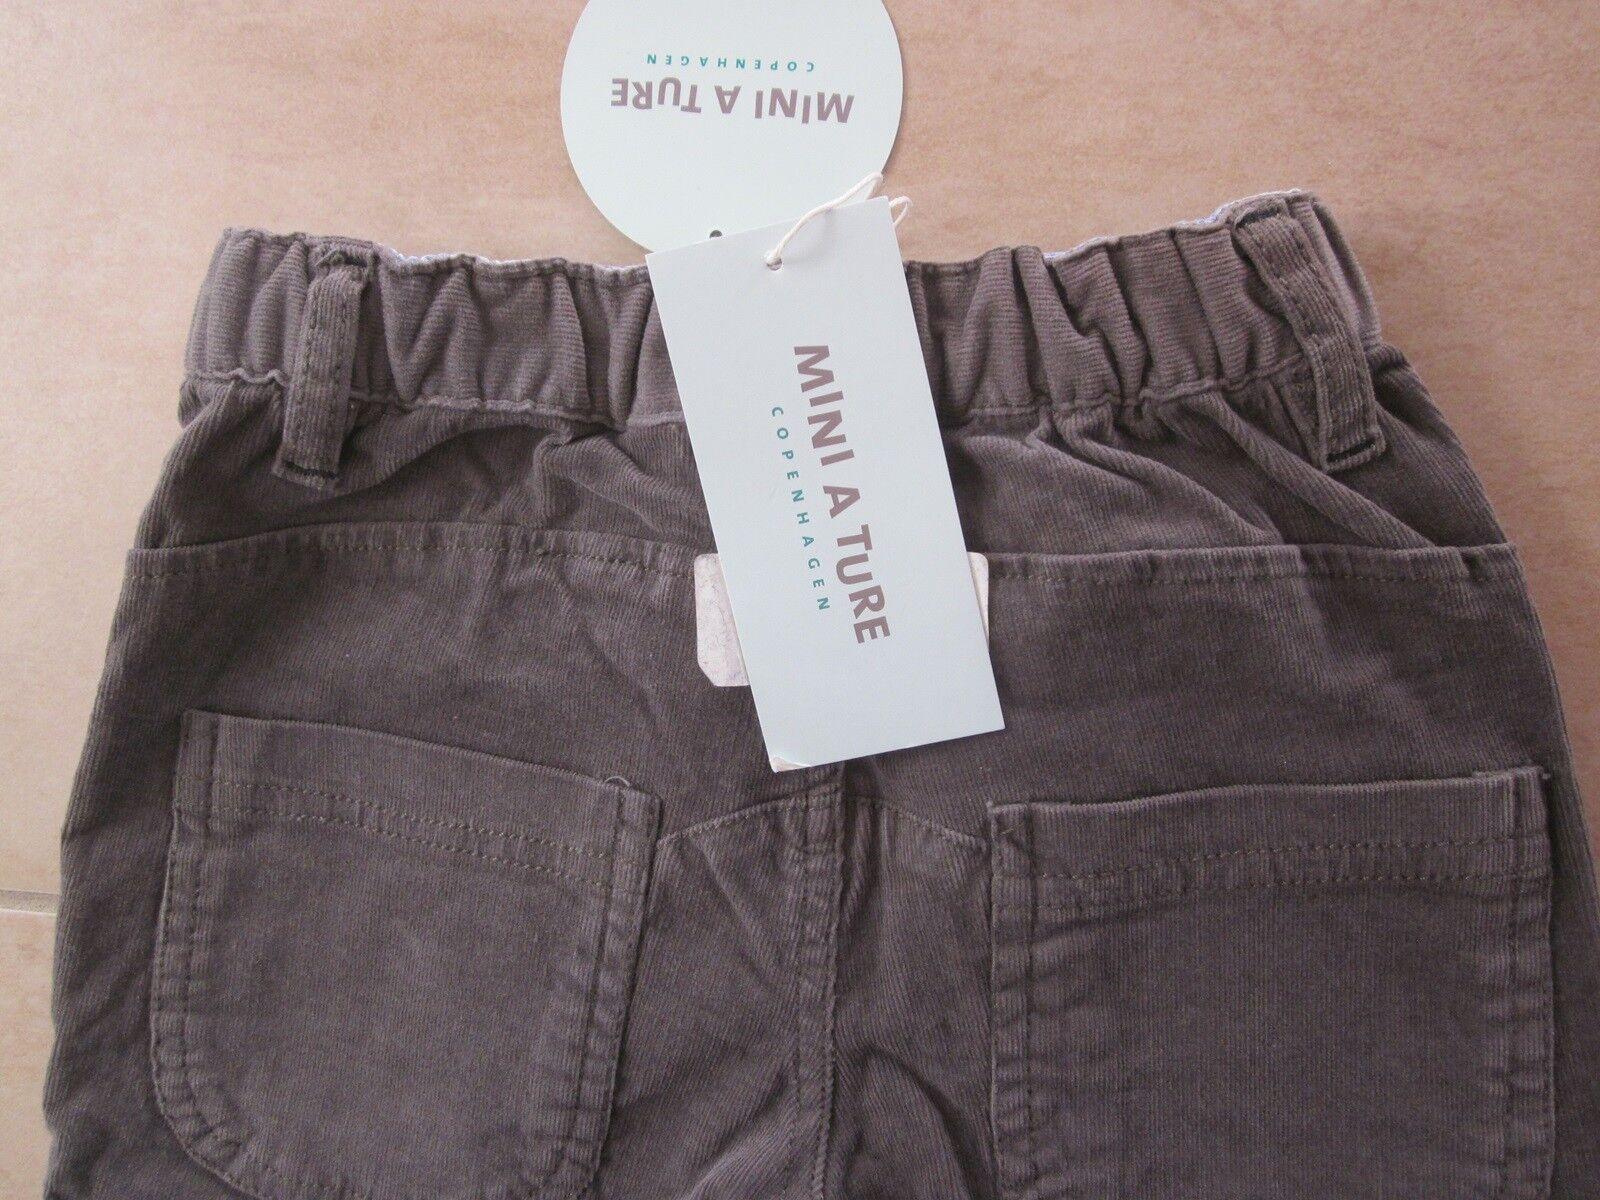 Bukser, Ny Bukser, Miniature